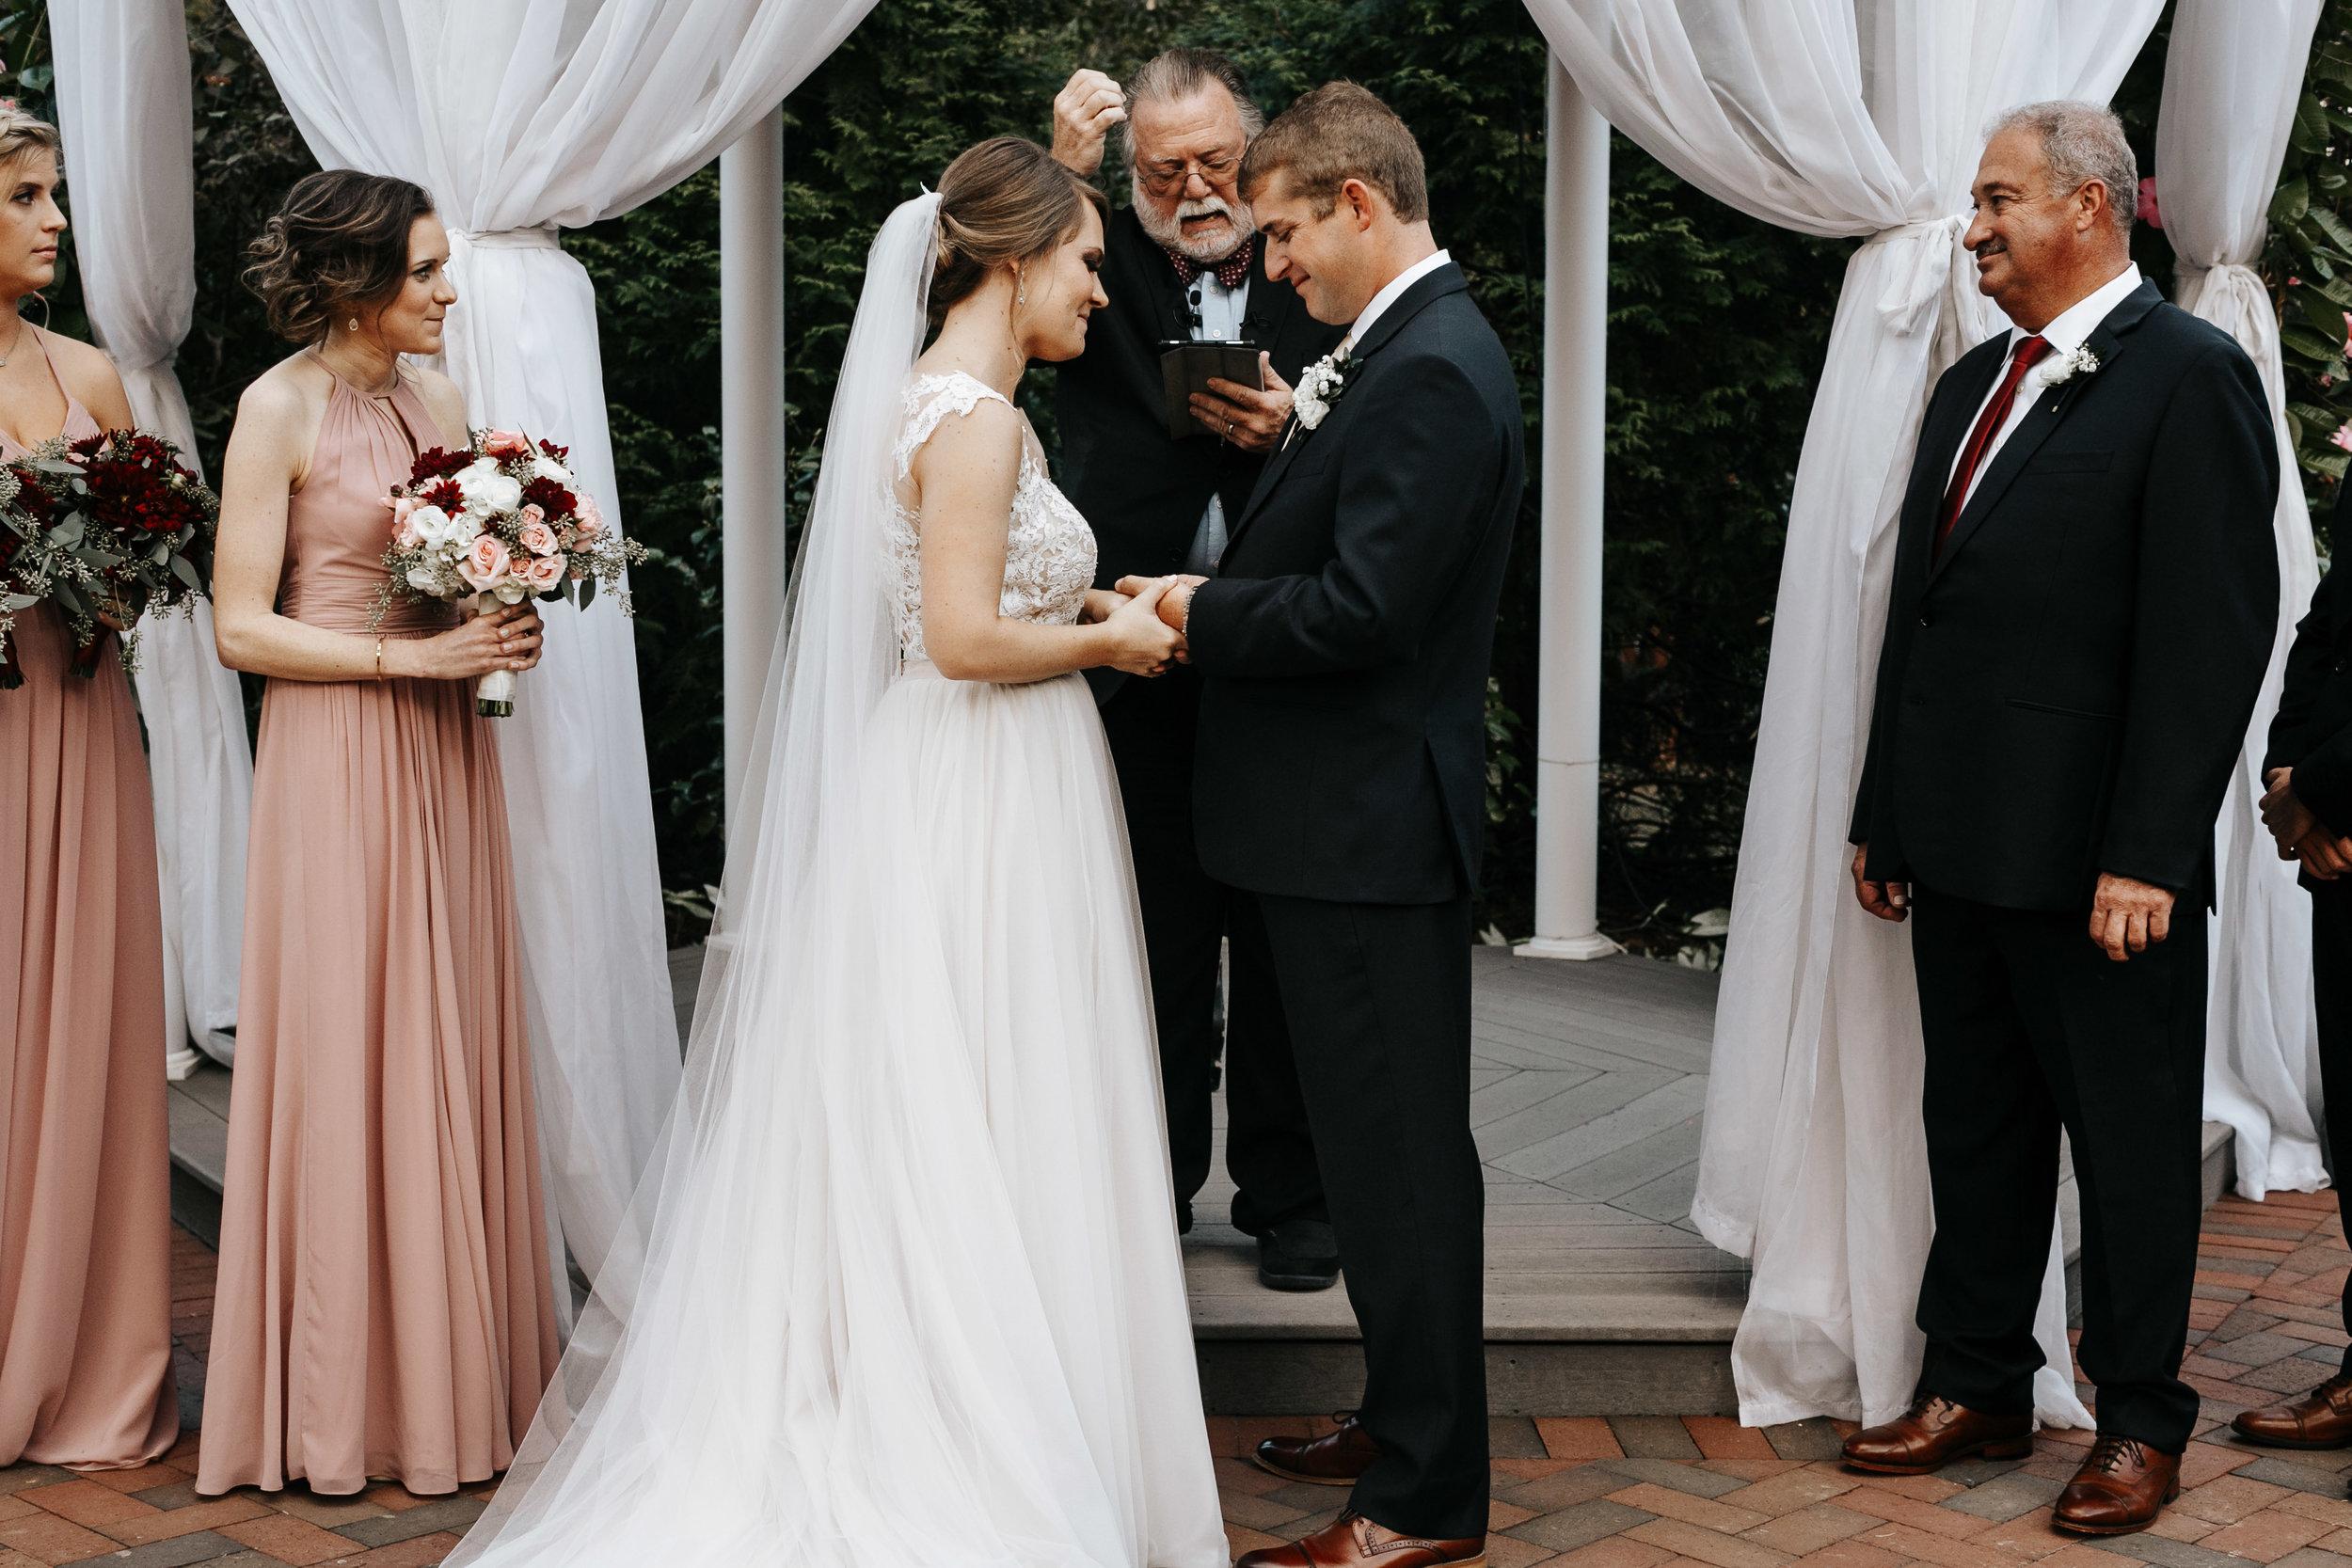 jessicabrandonwedding-37.jpg